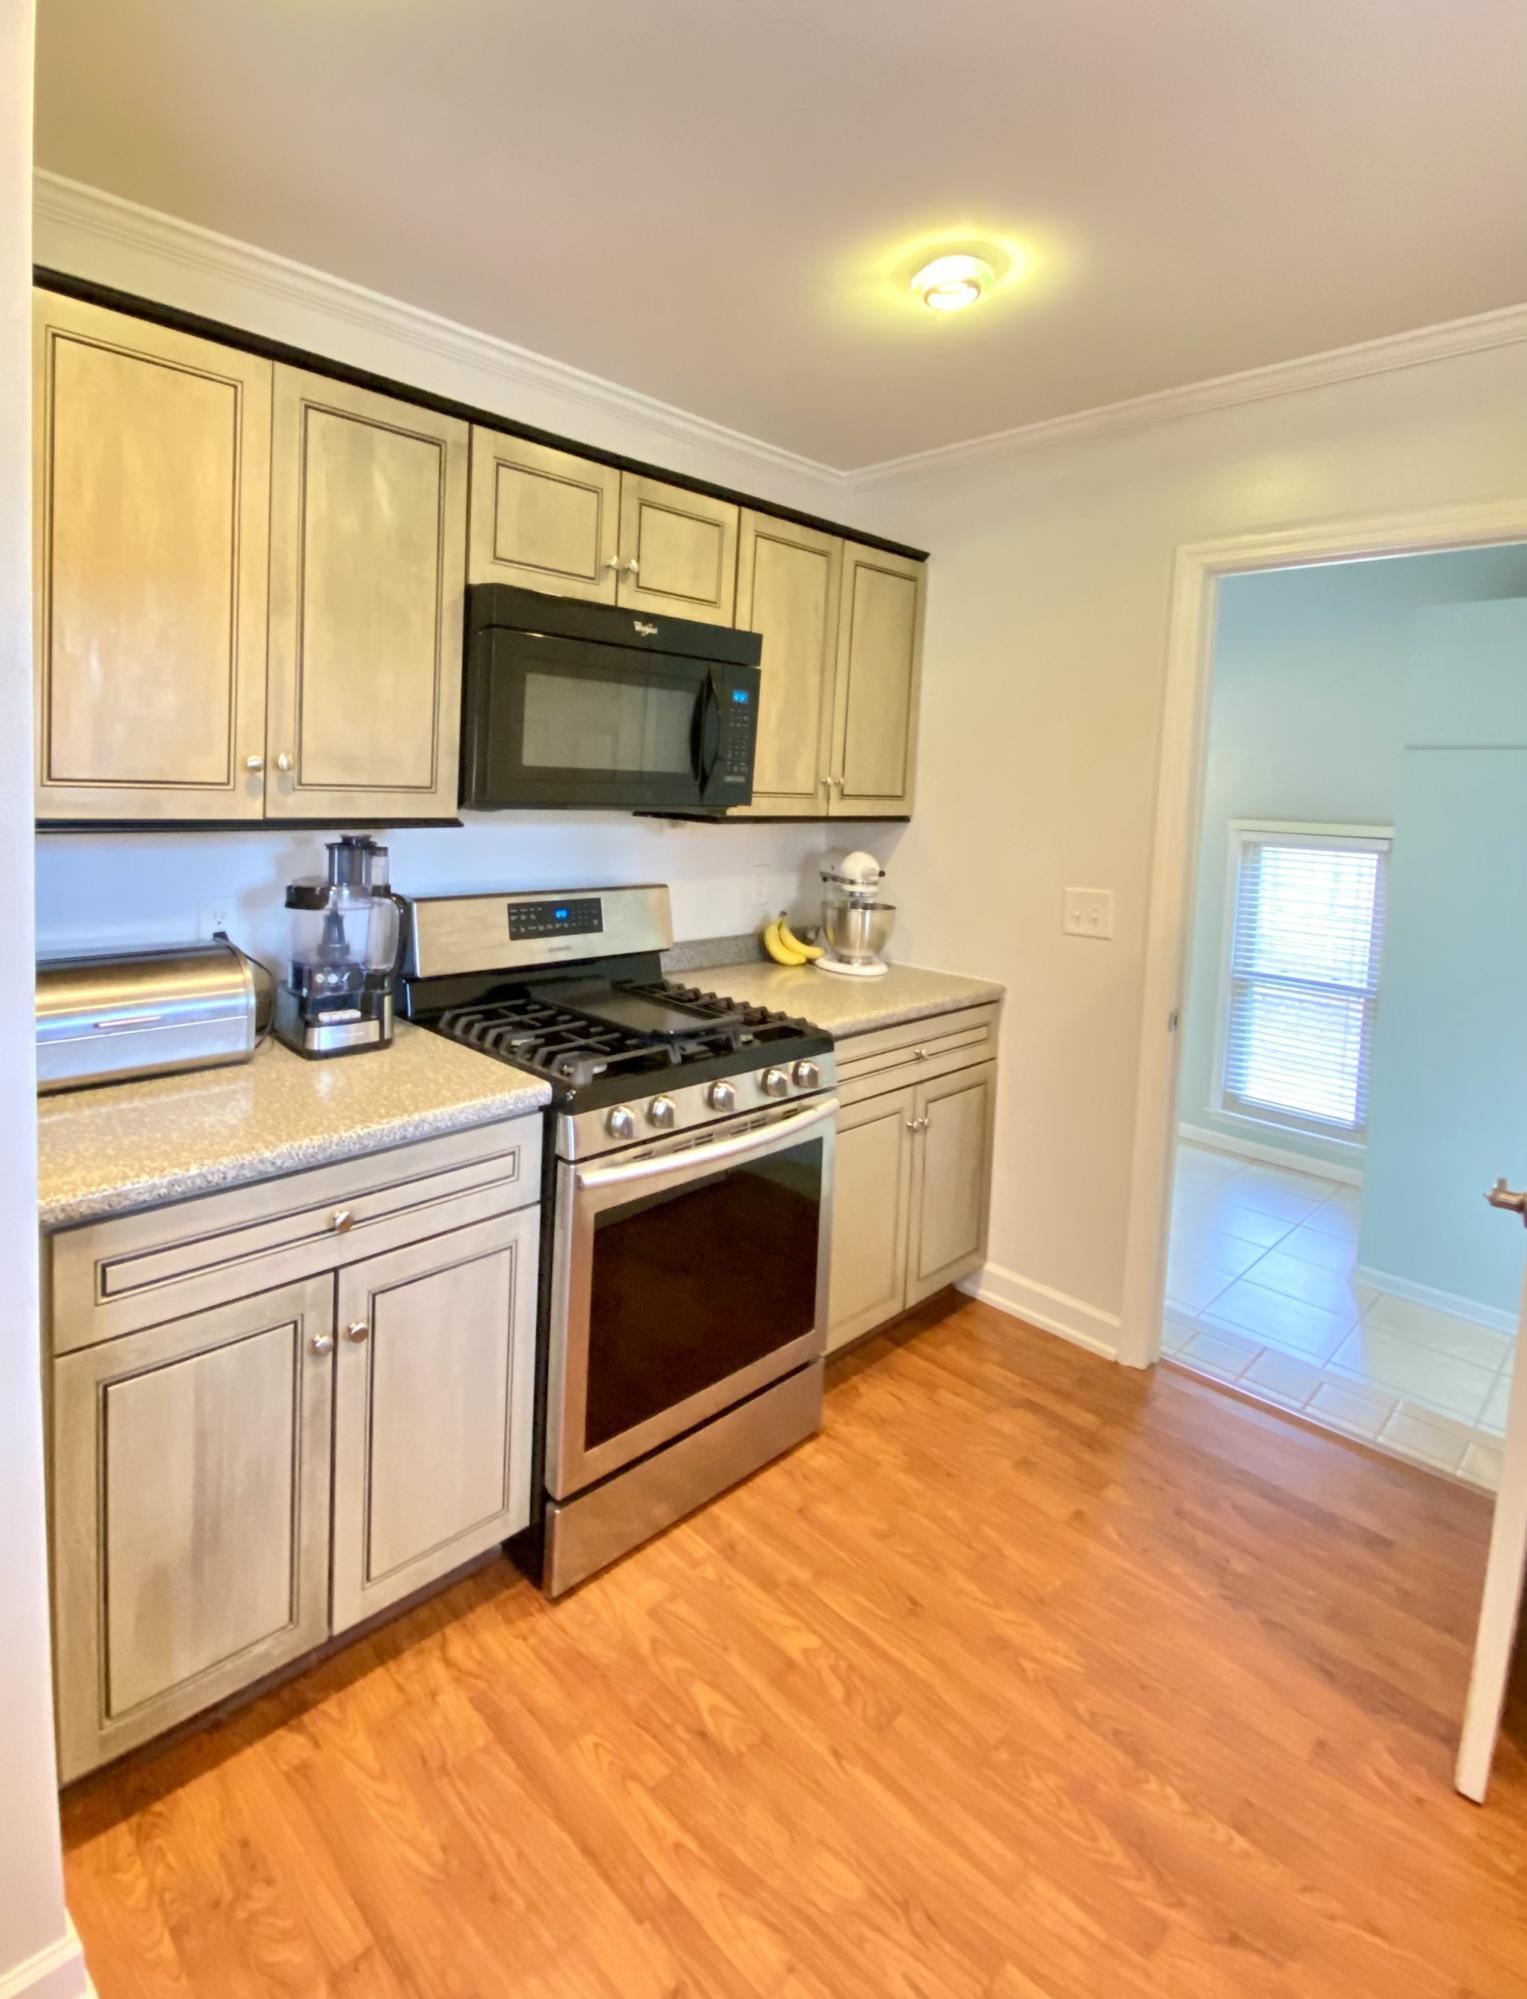 Palmetto Fort Homes For Sale - 1510 Lakeshore, Mount Pleasant, SC - 24